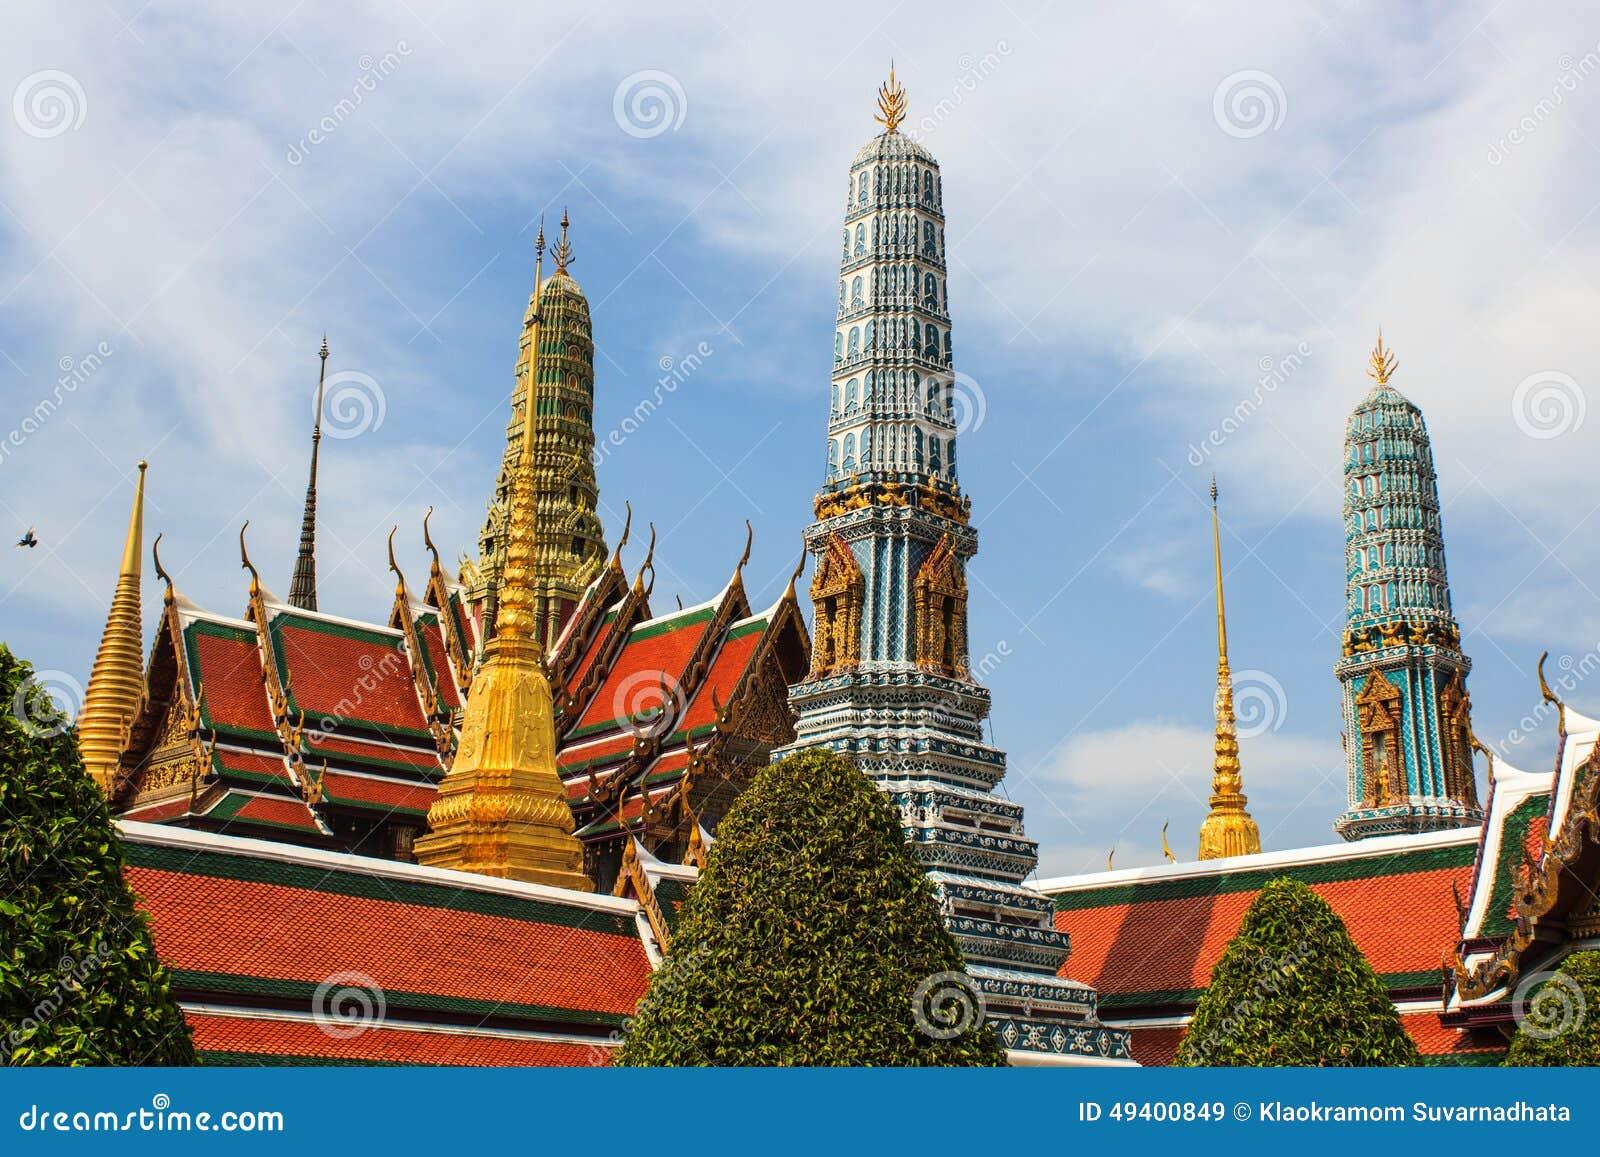 Download Emerald Buddha Temple, Wat Pra Kaew Stockbild - Bild von gold, kunst: 49400849